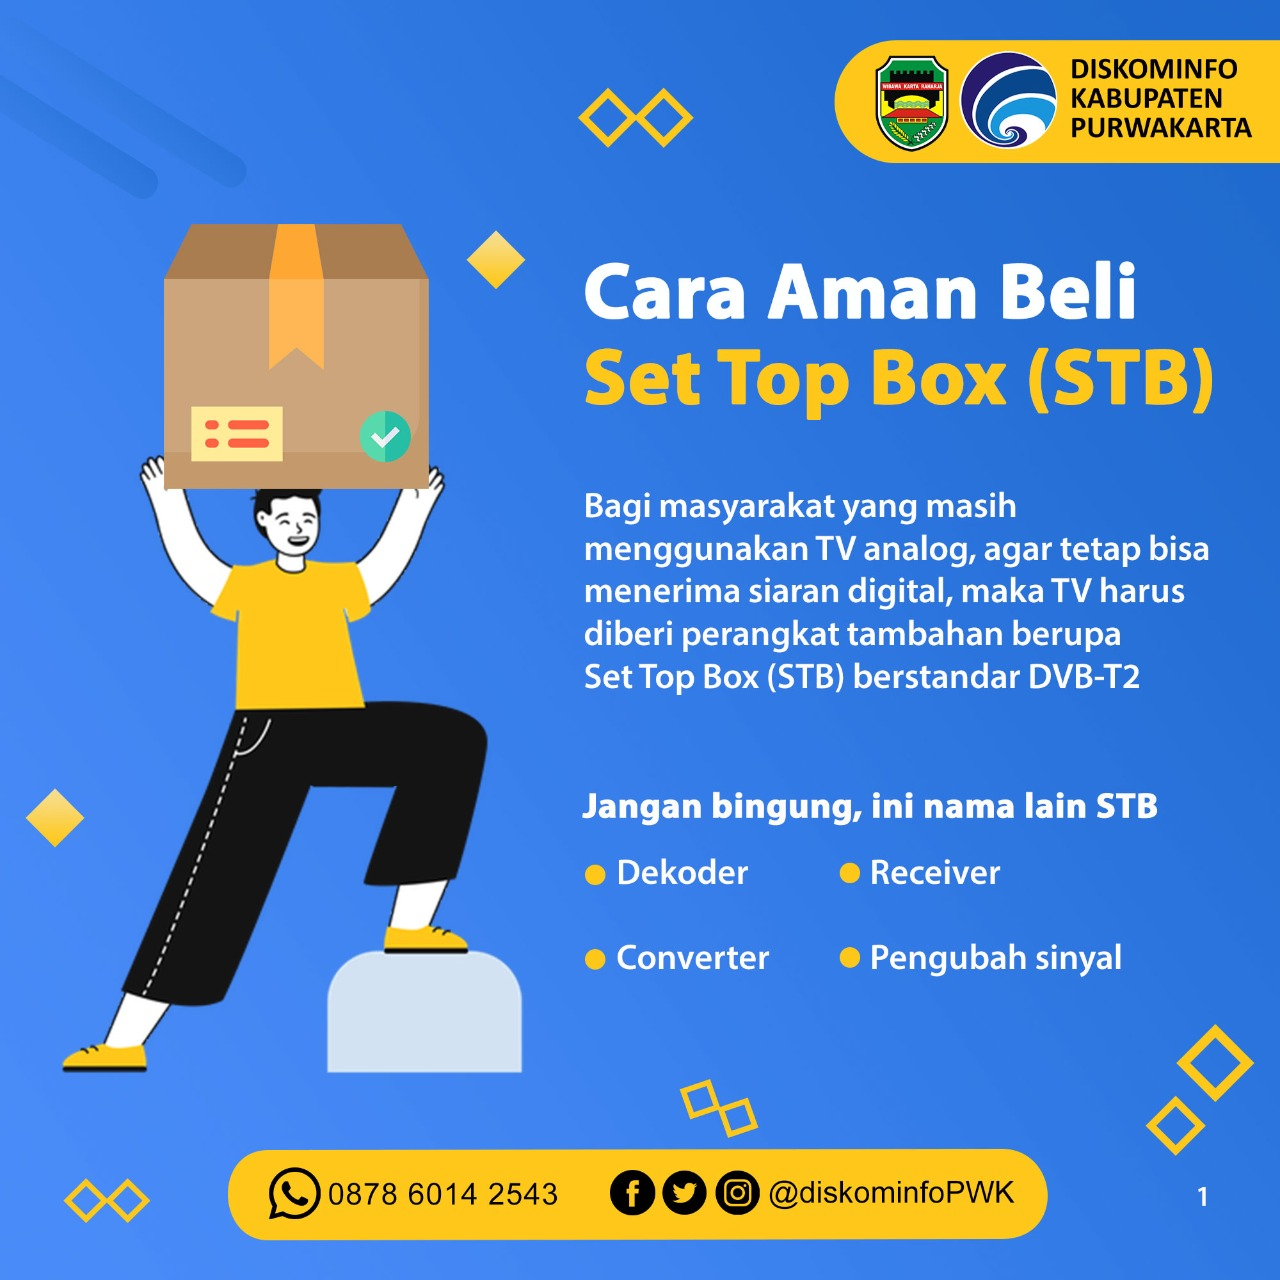 Cara Aman Beli Set Top Box (STB)